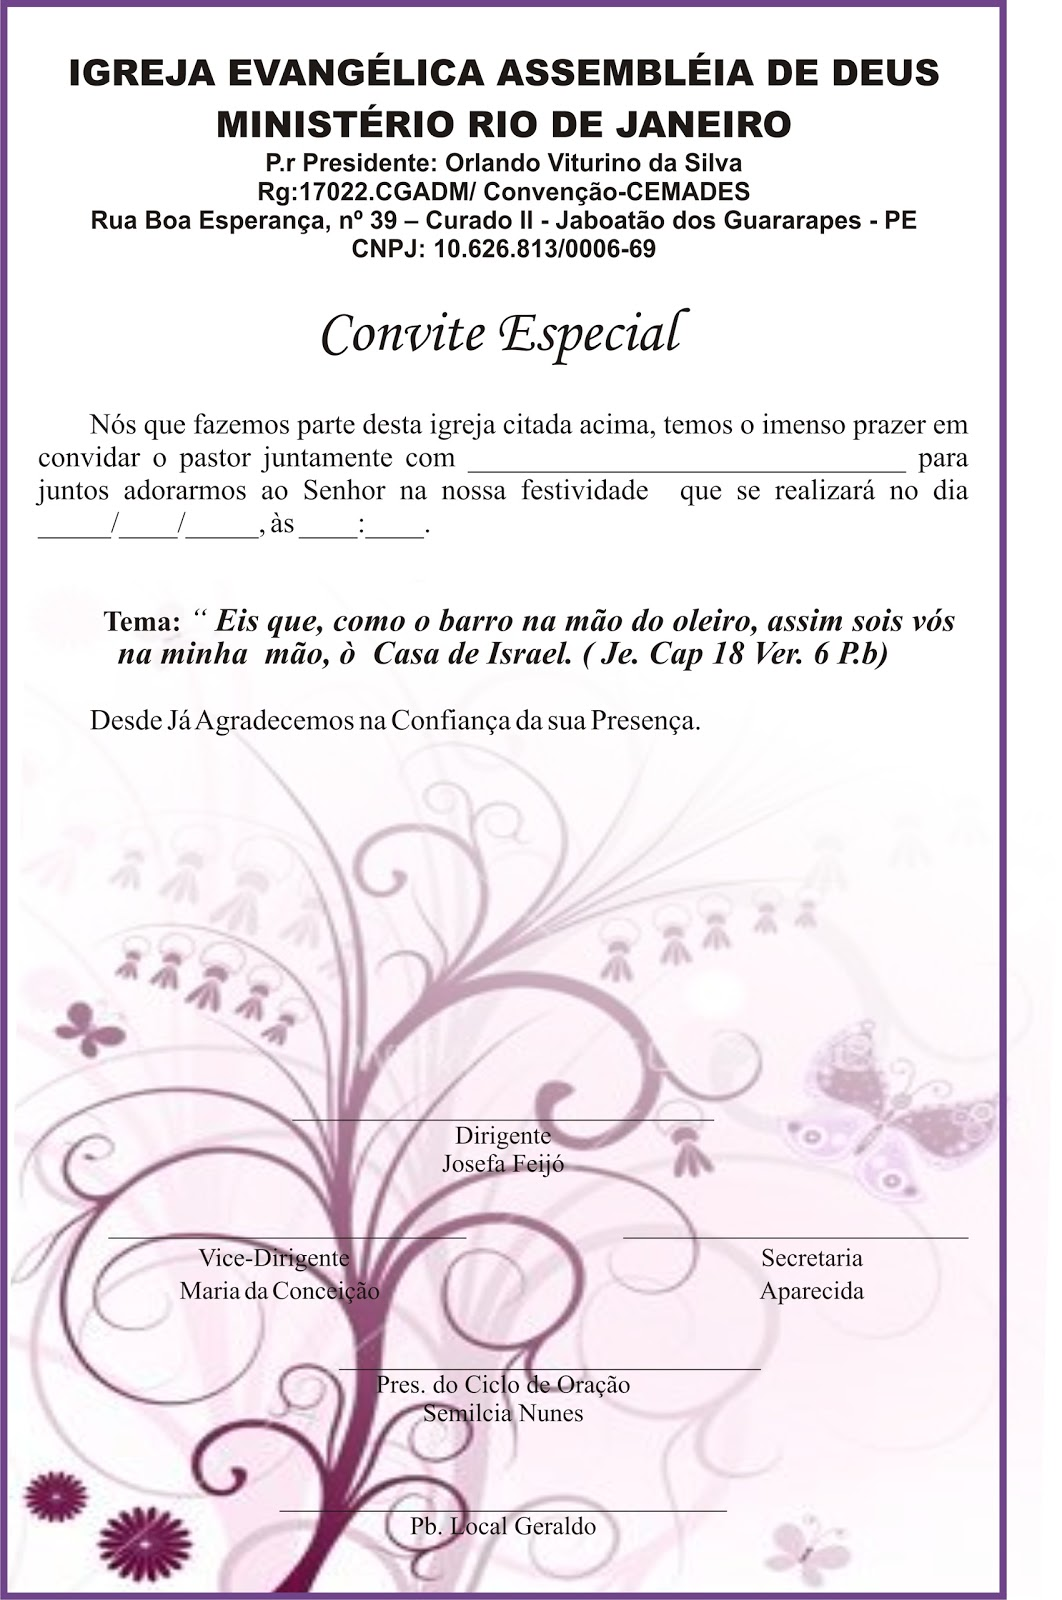 modelo de convite para igreja especial